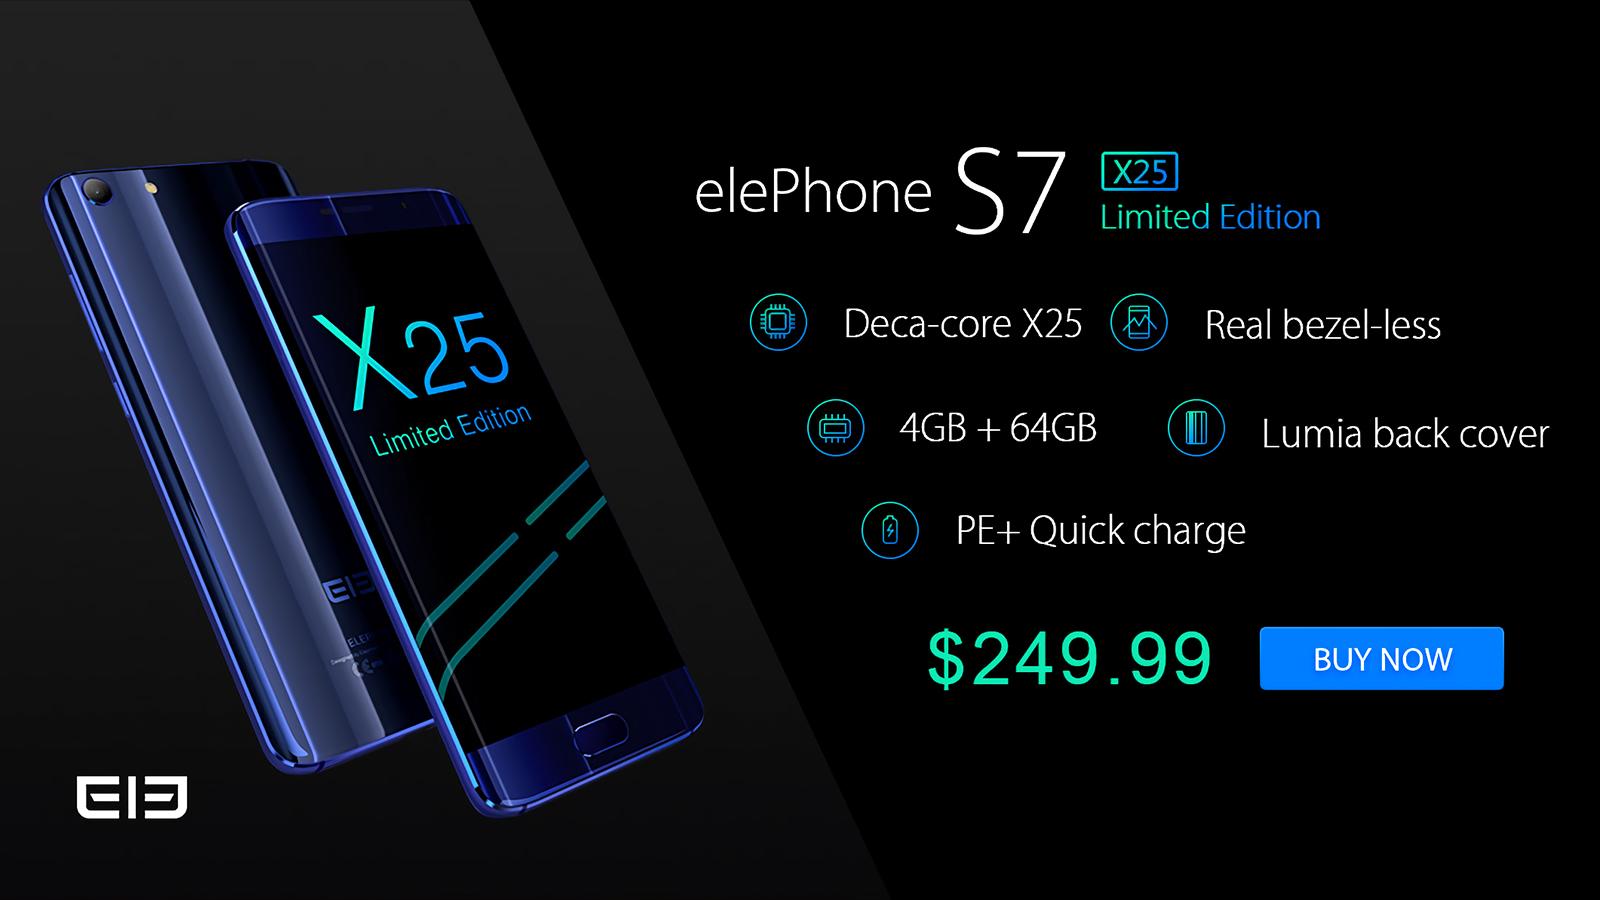 Elephone S7 Limited Edtion